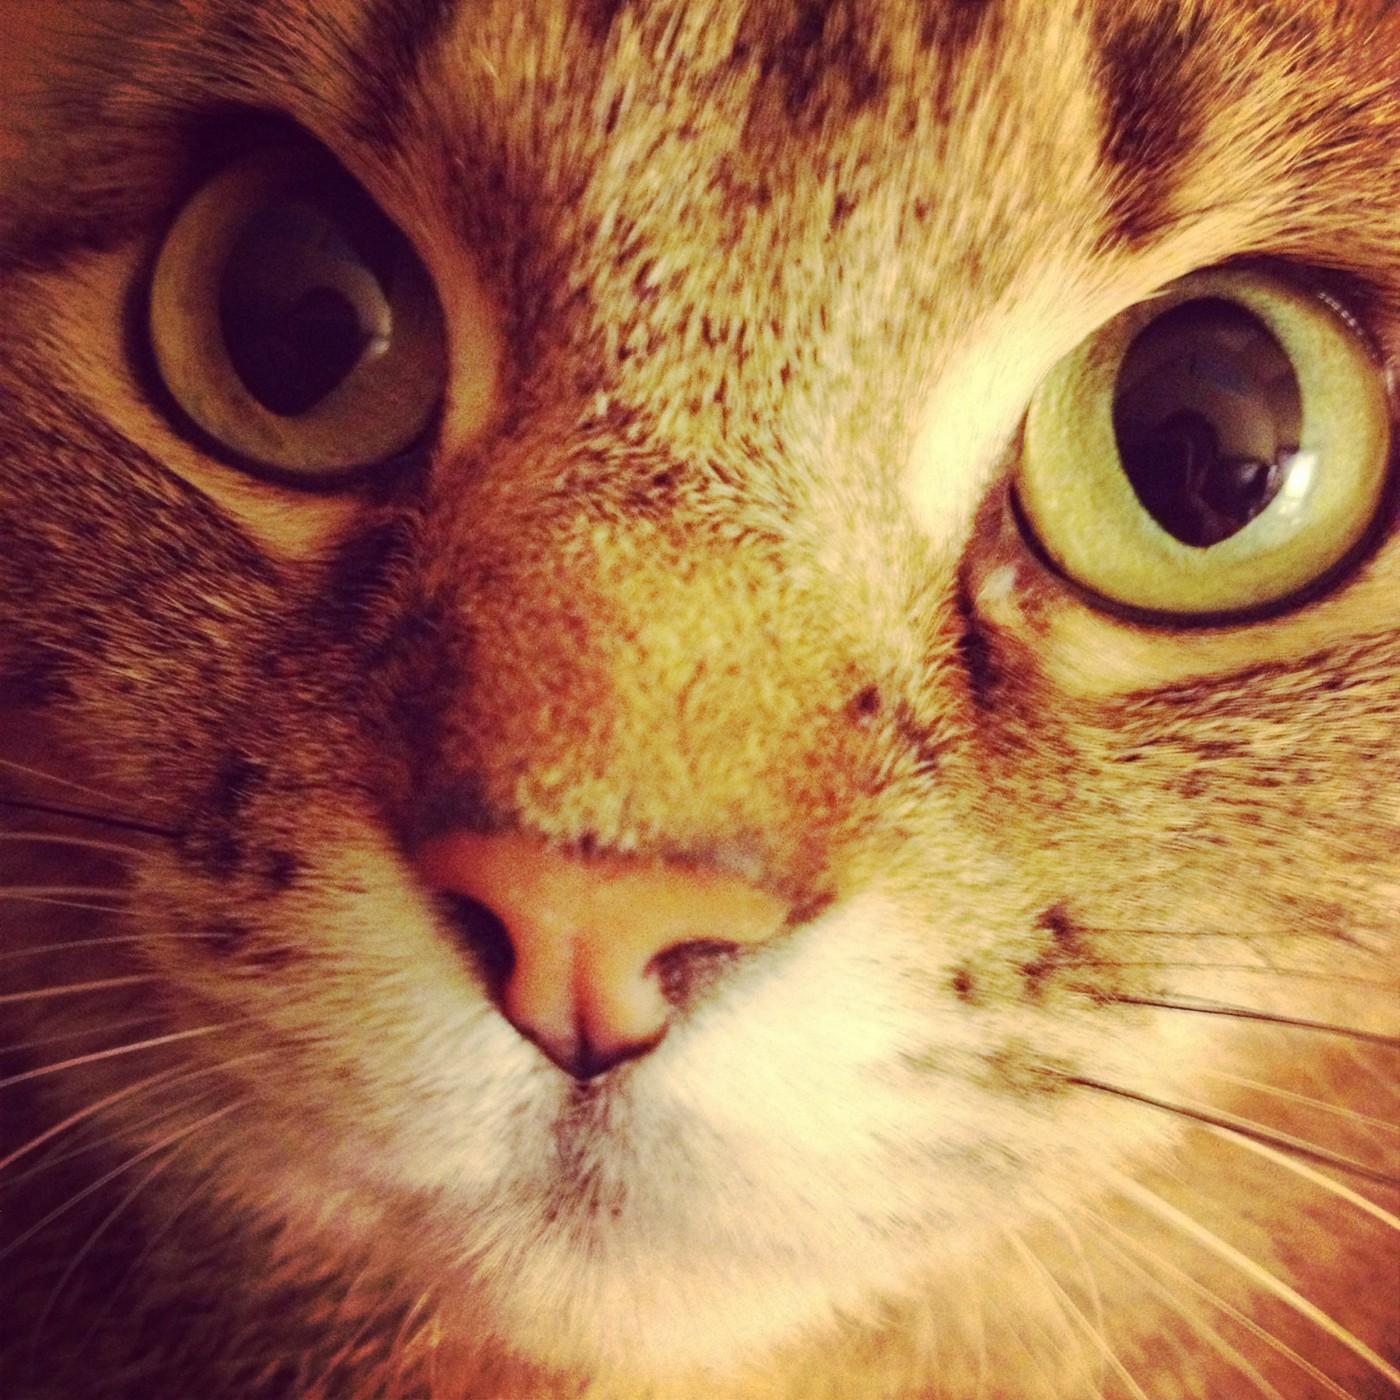 cat's eyes by Rachel B. Baxter